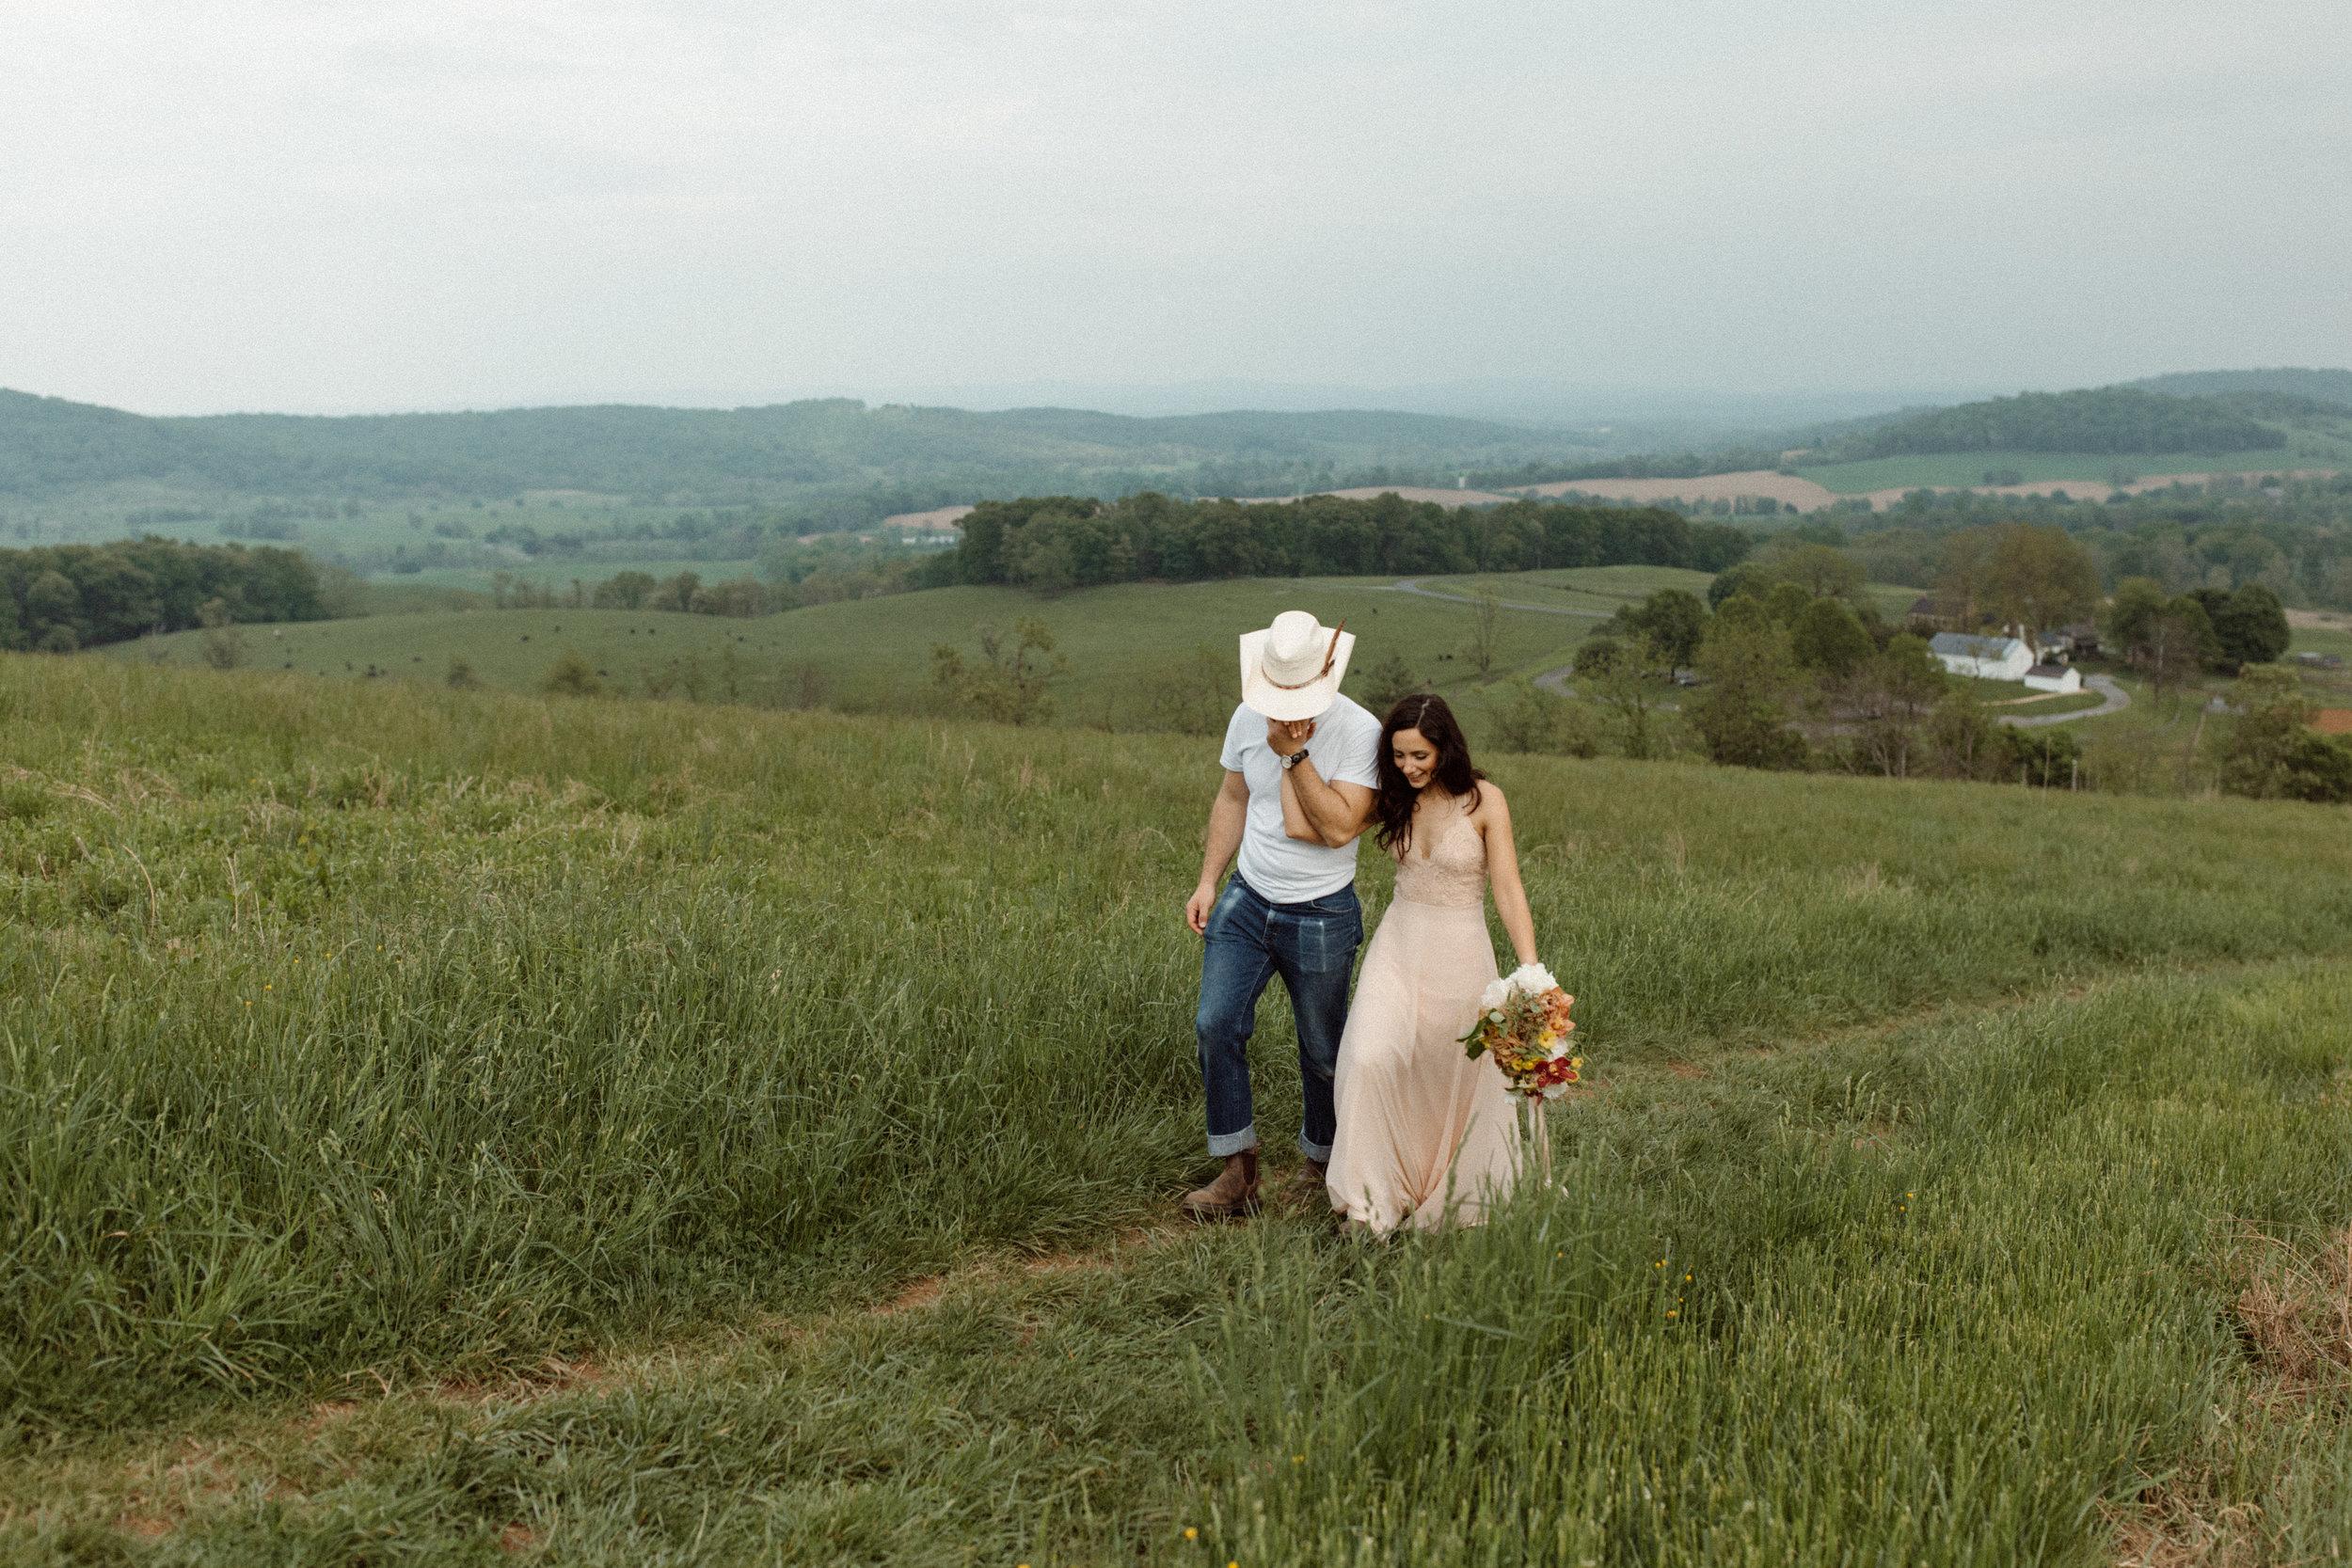 kelsey&mark-engagement-skymeadows-2019-peytoncurry-9402.jpg